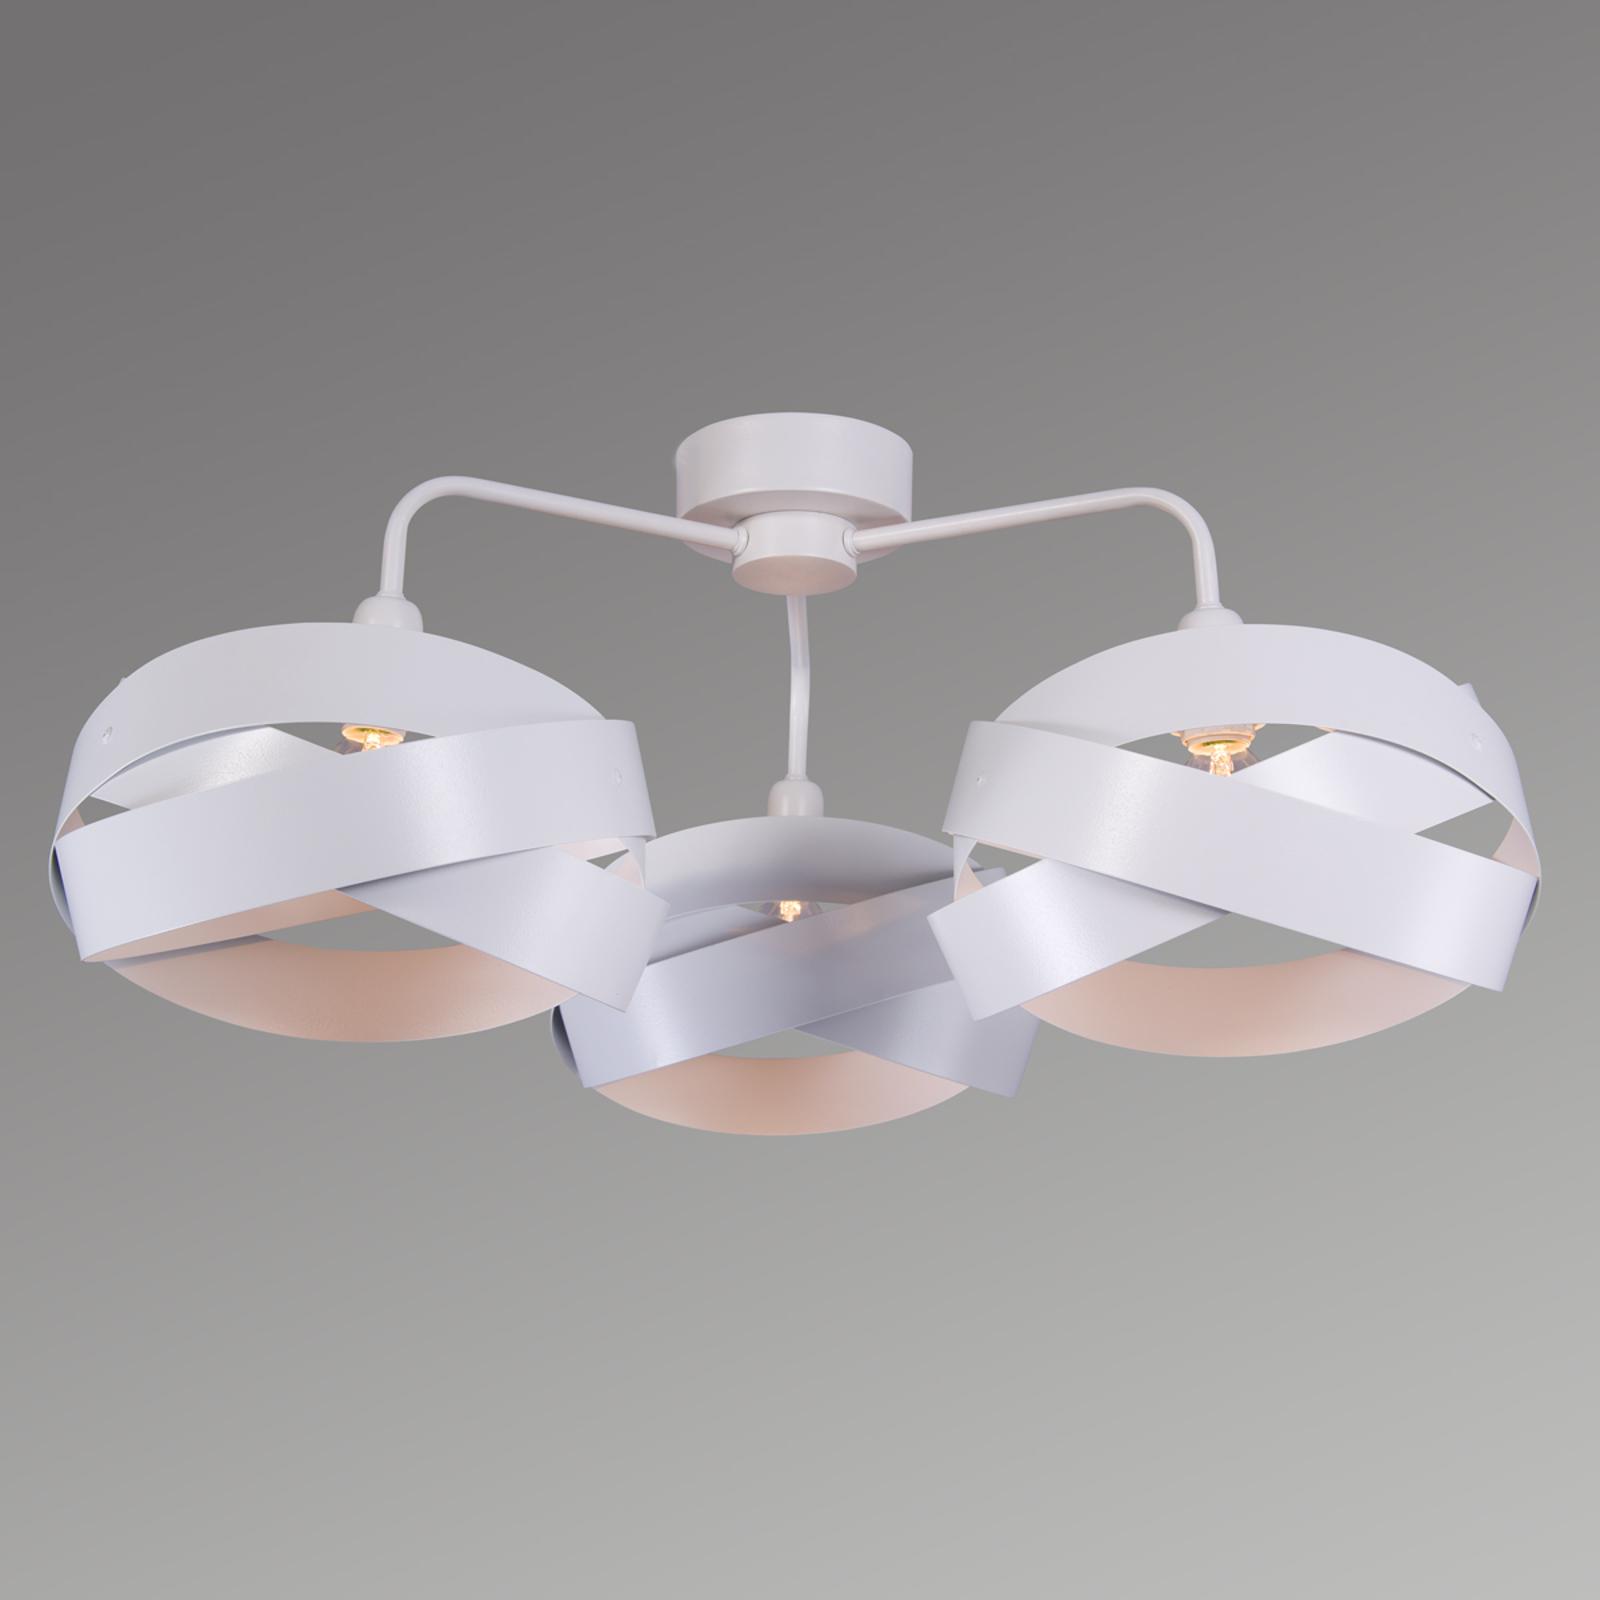 Trendy plafondlamp Tornado met drie kappen